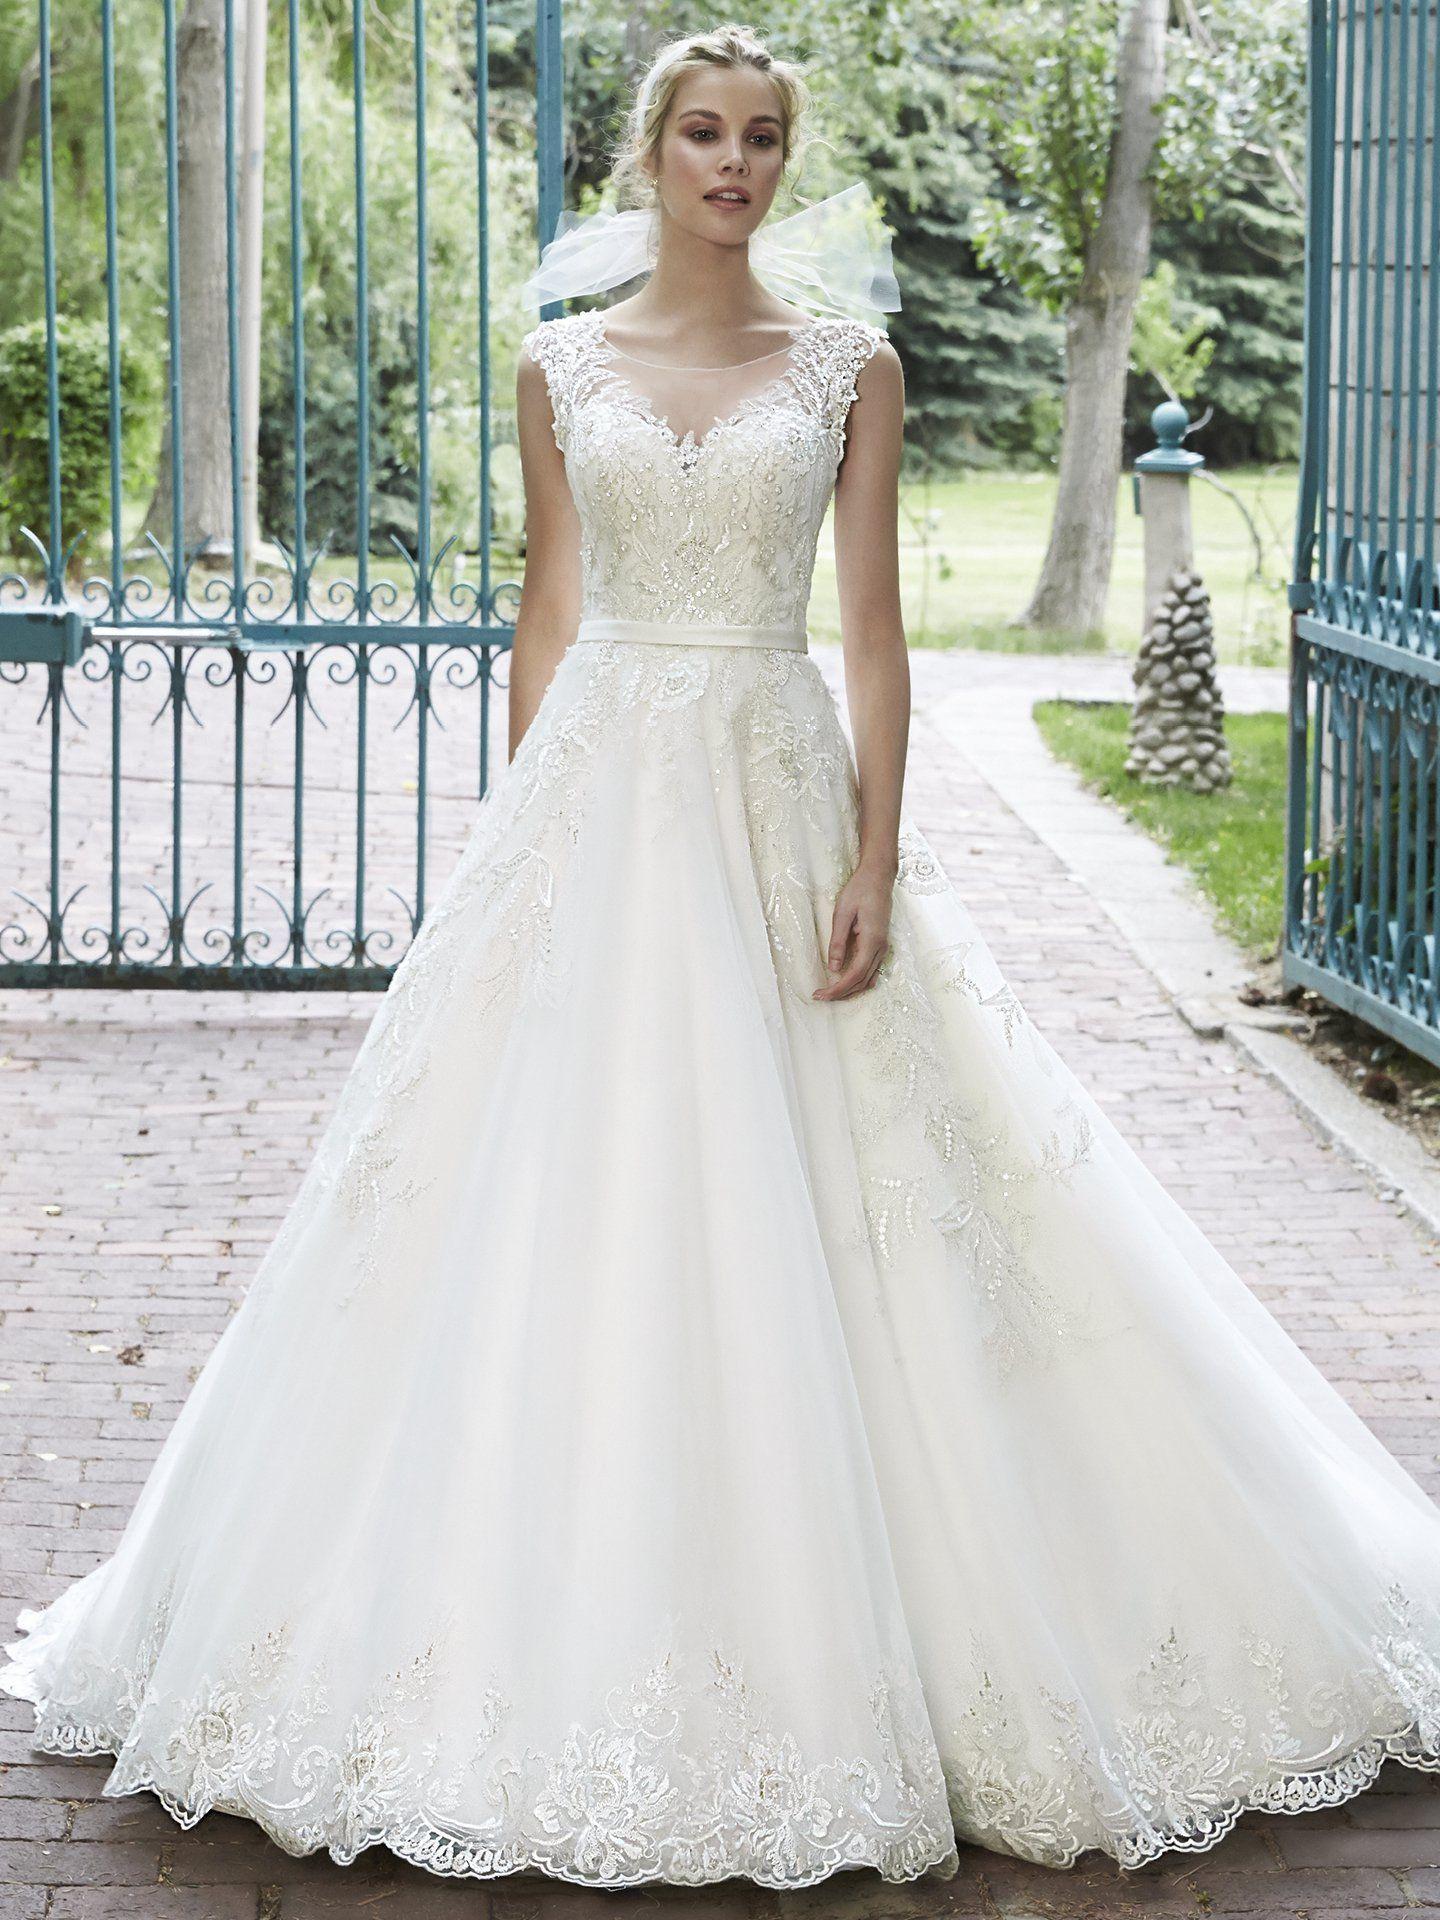 Maggie Sottero Bellissima | Weddings | Pinterest | Maggie sottero ...